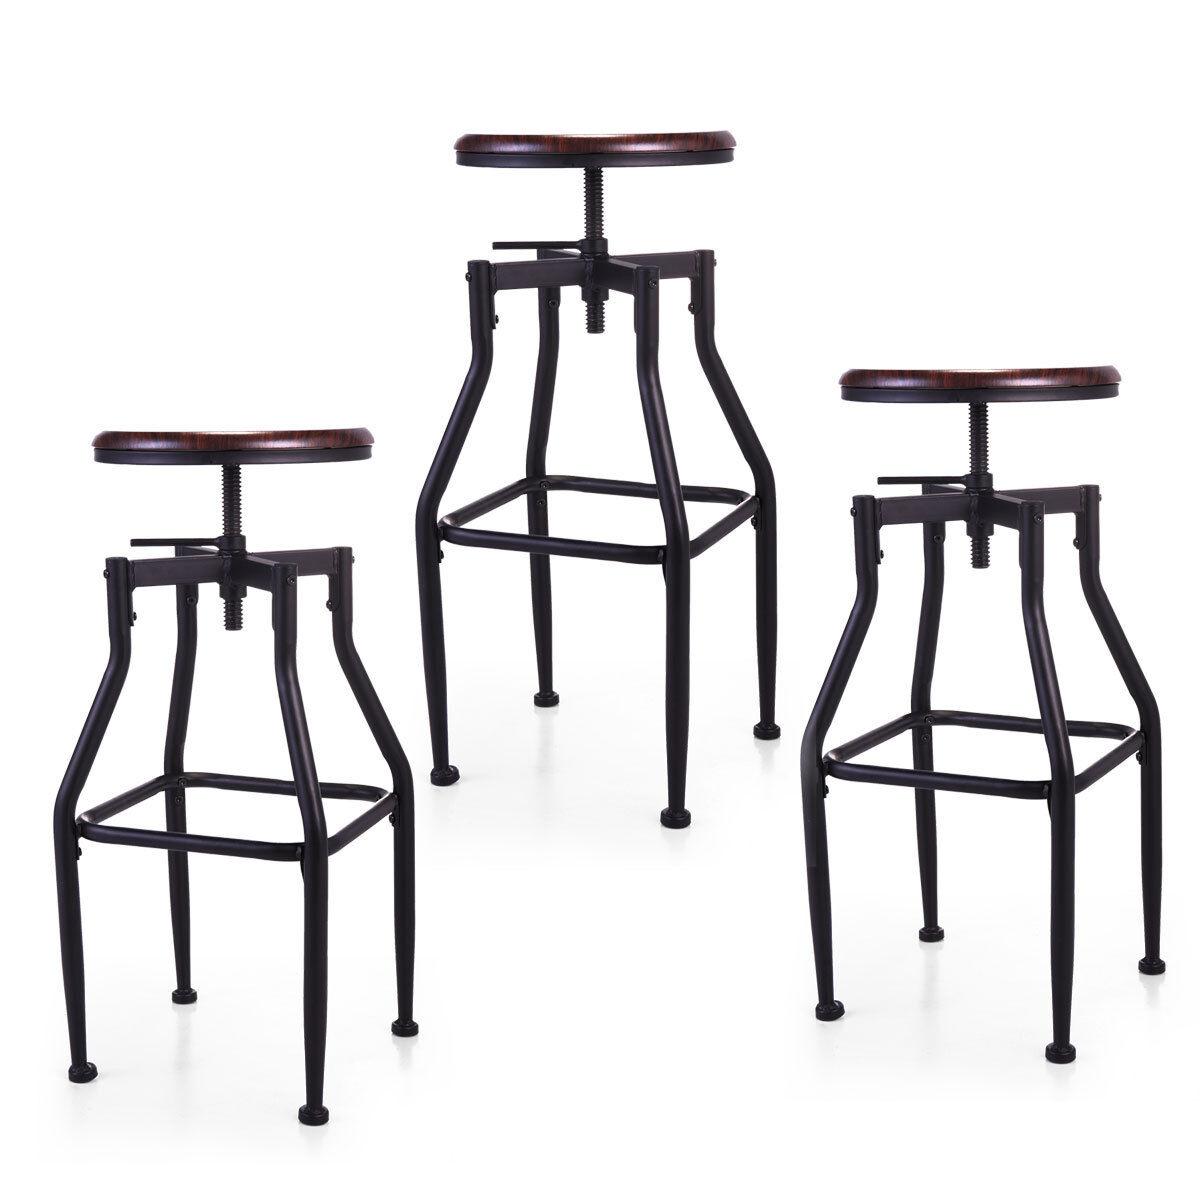 Pleasant 1 2 3 Set Height Adjustable Industrial Swivel Metal Counter Height Bar Stool Machost Co Dining Chair Design Ideas Machostcouk